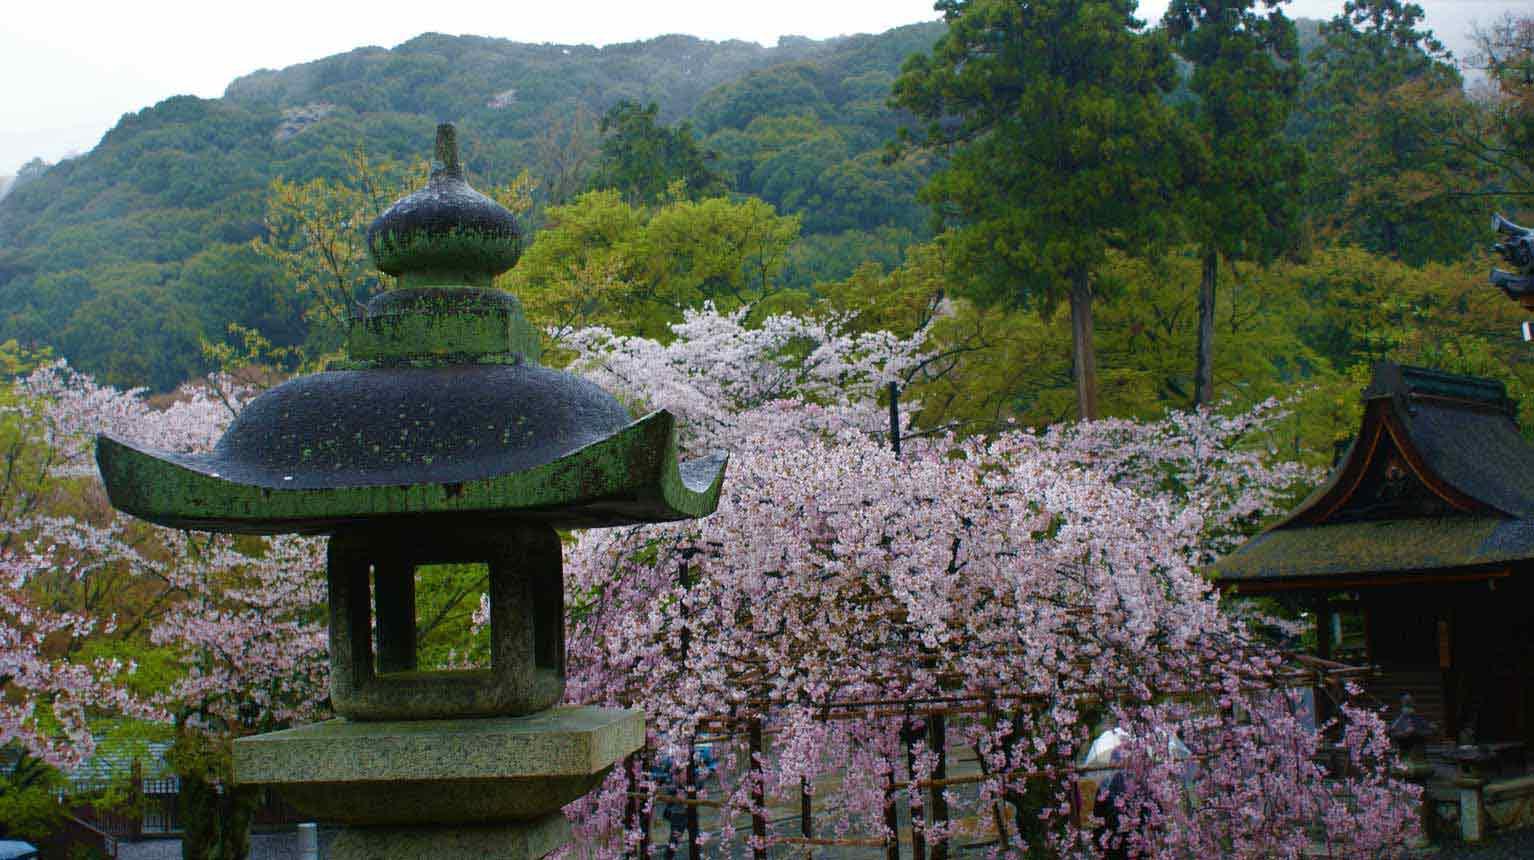 curly nomad asia japan temple sakura hanami cherry trees image